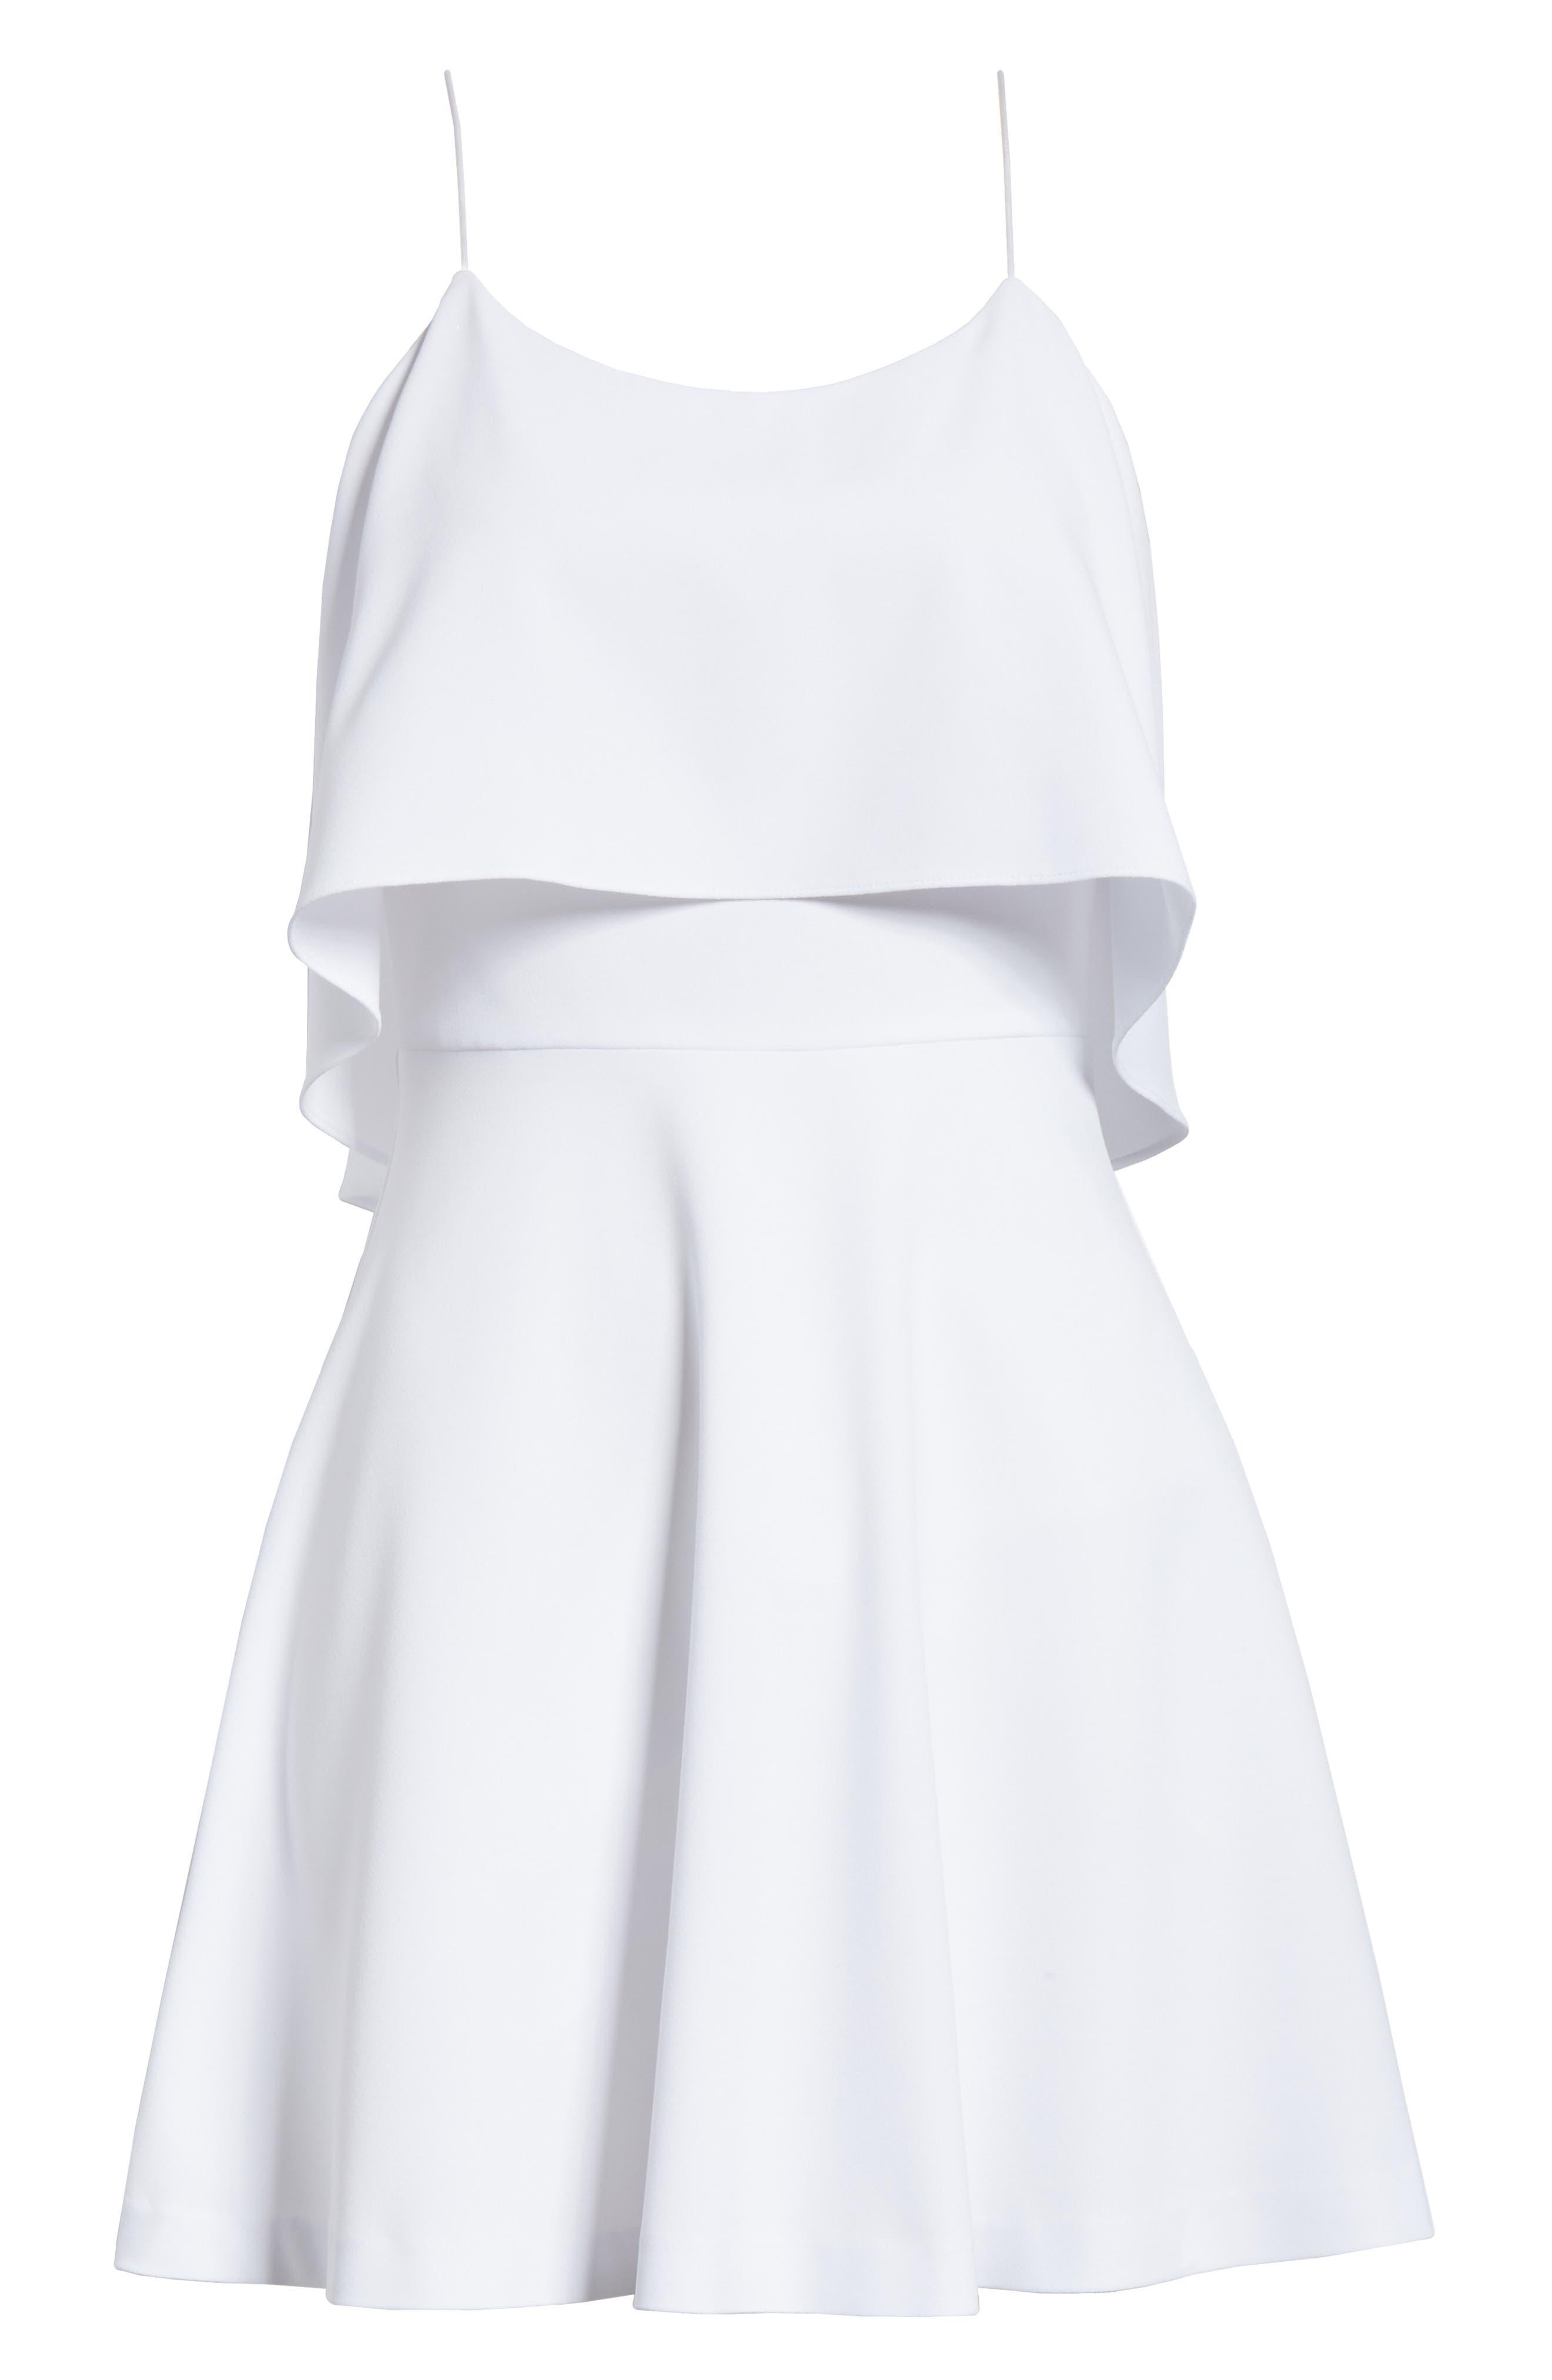 Kipp Layered Ruffle Short Dress,                             Alternate thumbnail 6, color,                             100